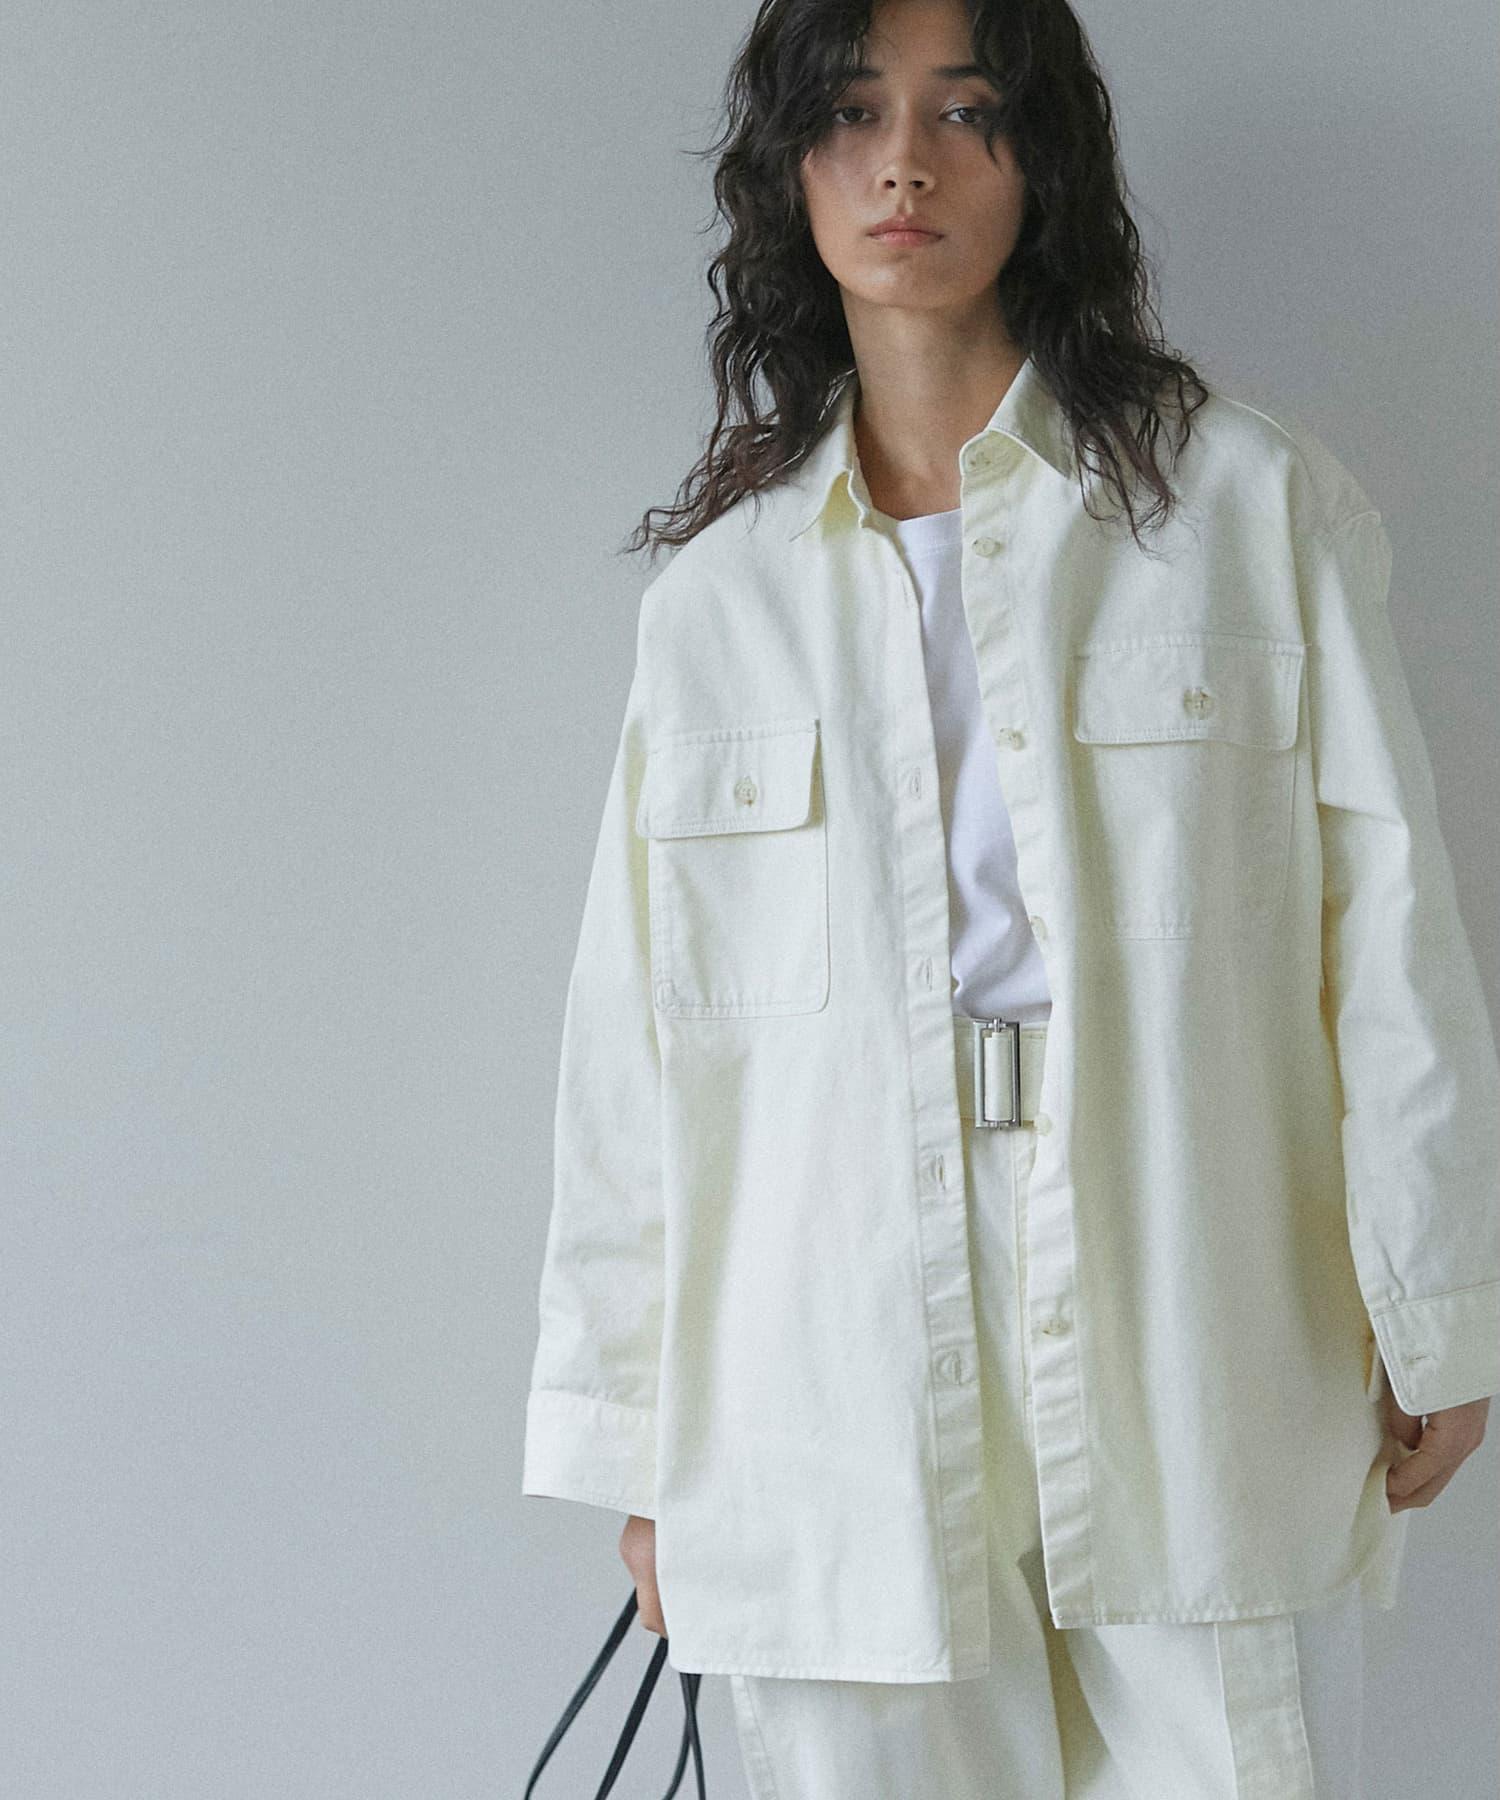 GALLARDAGALANTE(ガリャルダガランテ) ワークシャツジャケット